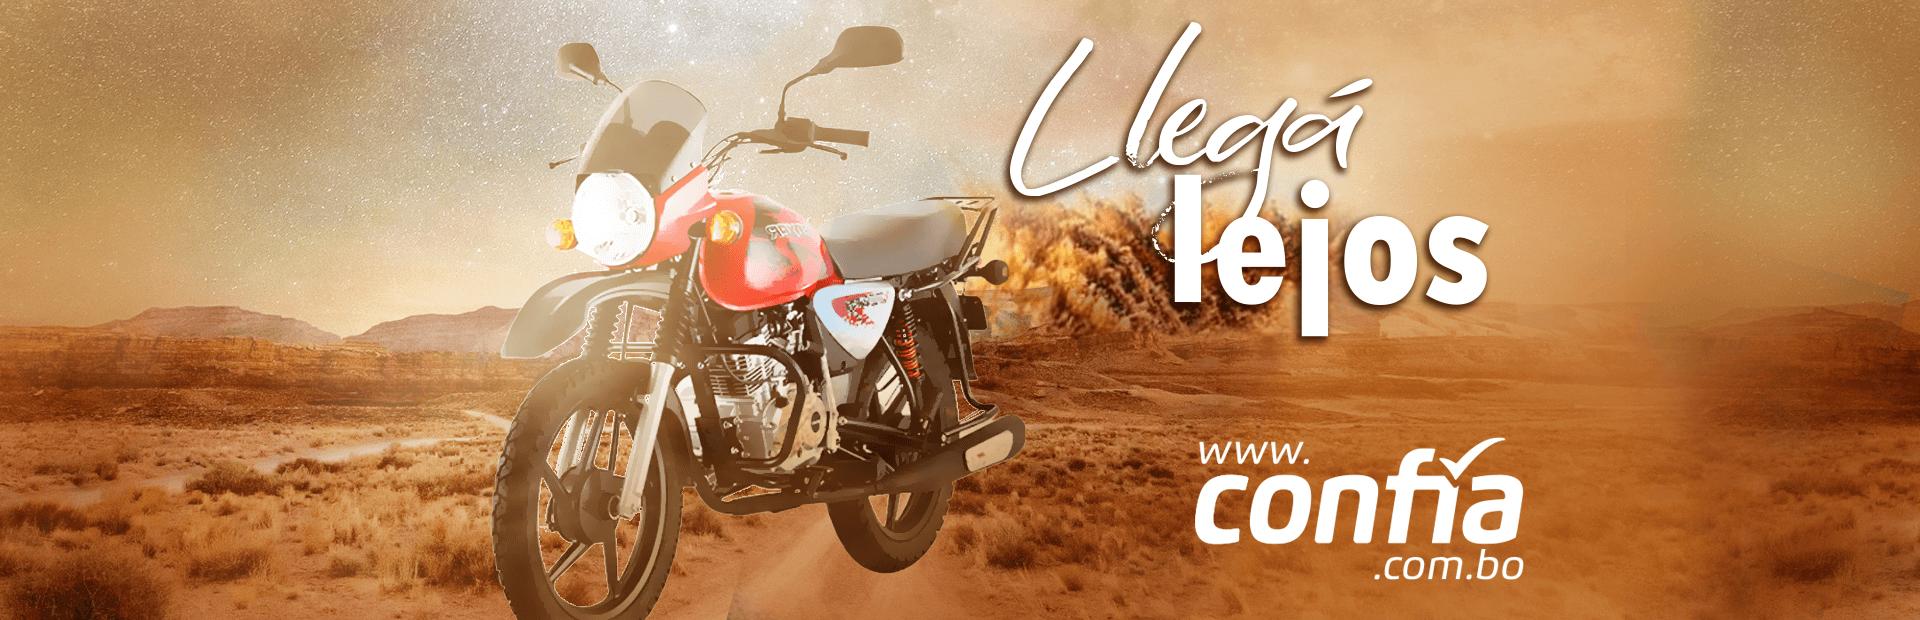 WEB mayo cover moto